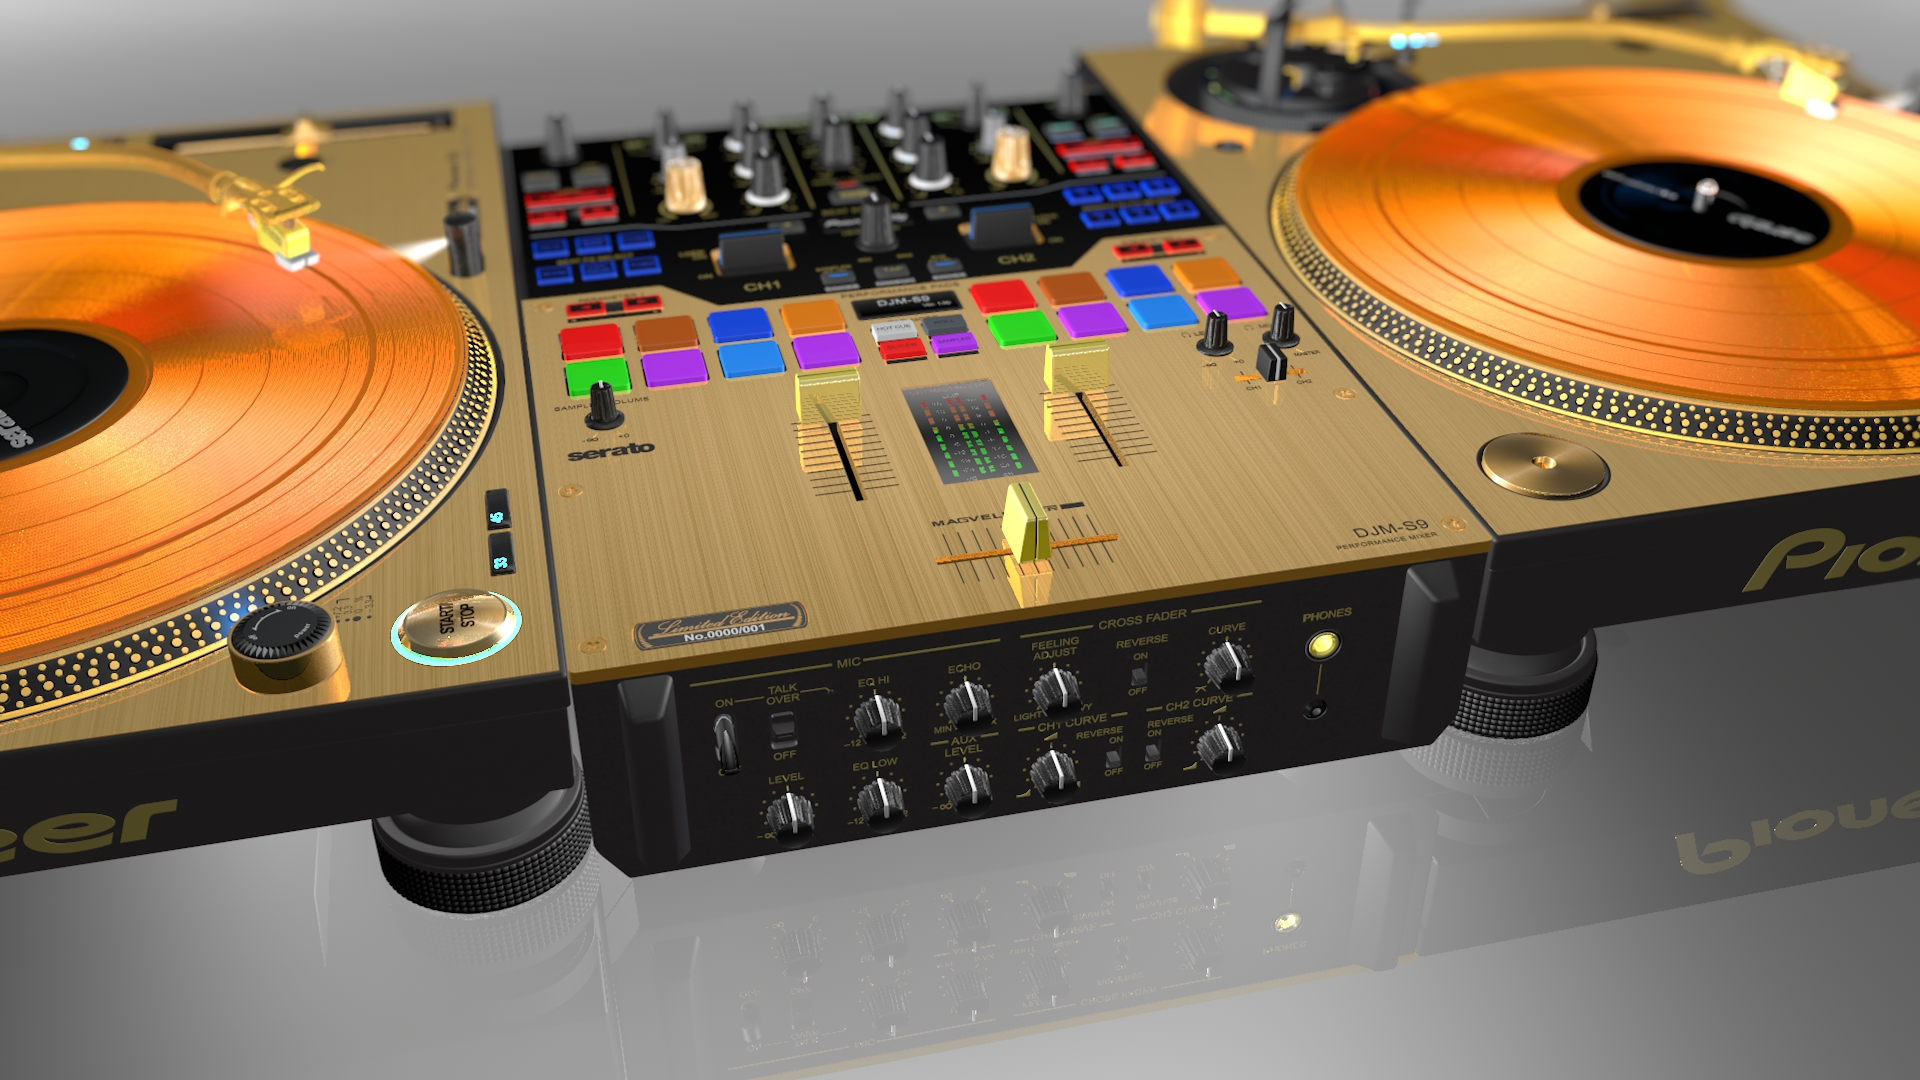 3d Wallpaper For S9 Plus Realistic Gold Prodj Turntable Pioneer Plx1000 Amp Mixer Djm